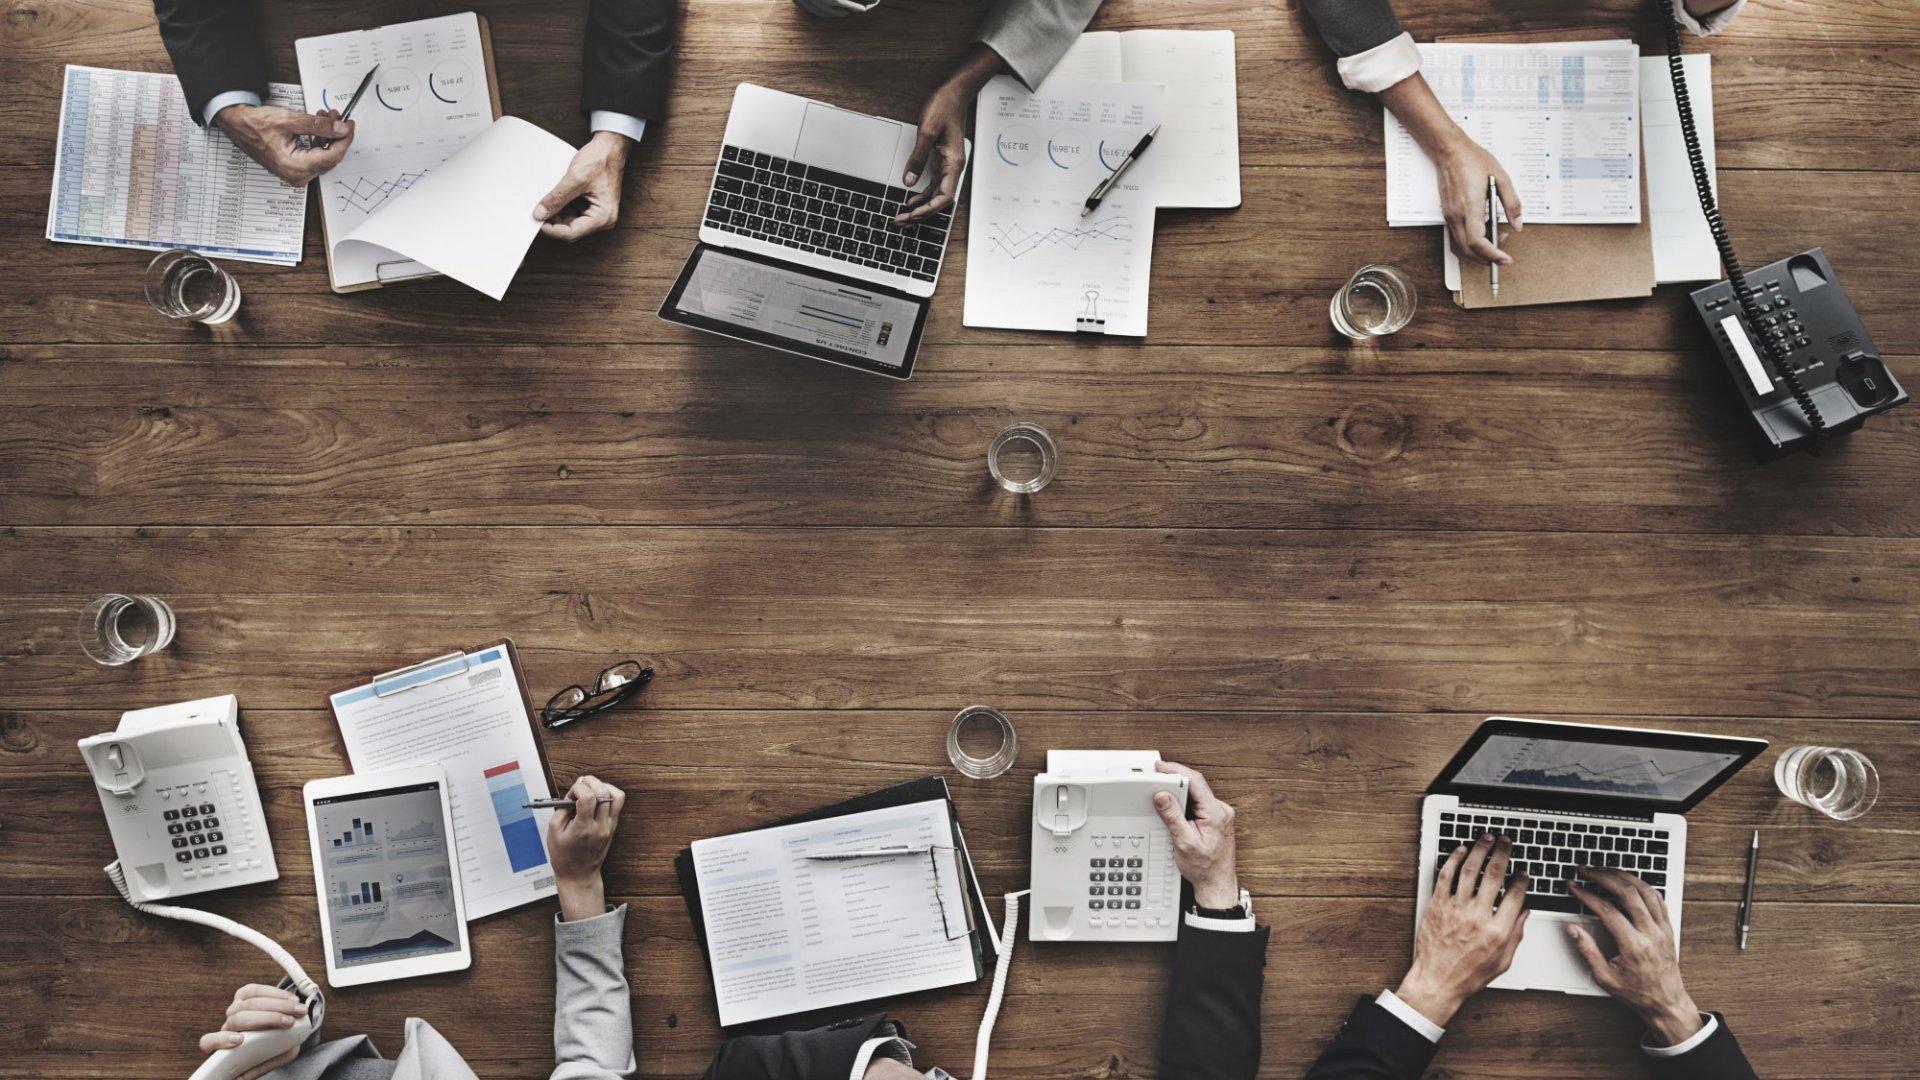 3 Ways to Make Summer Meetings Both Productive and Fun